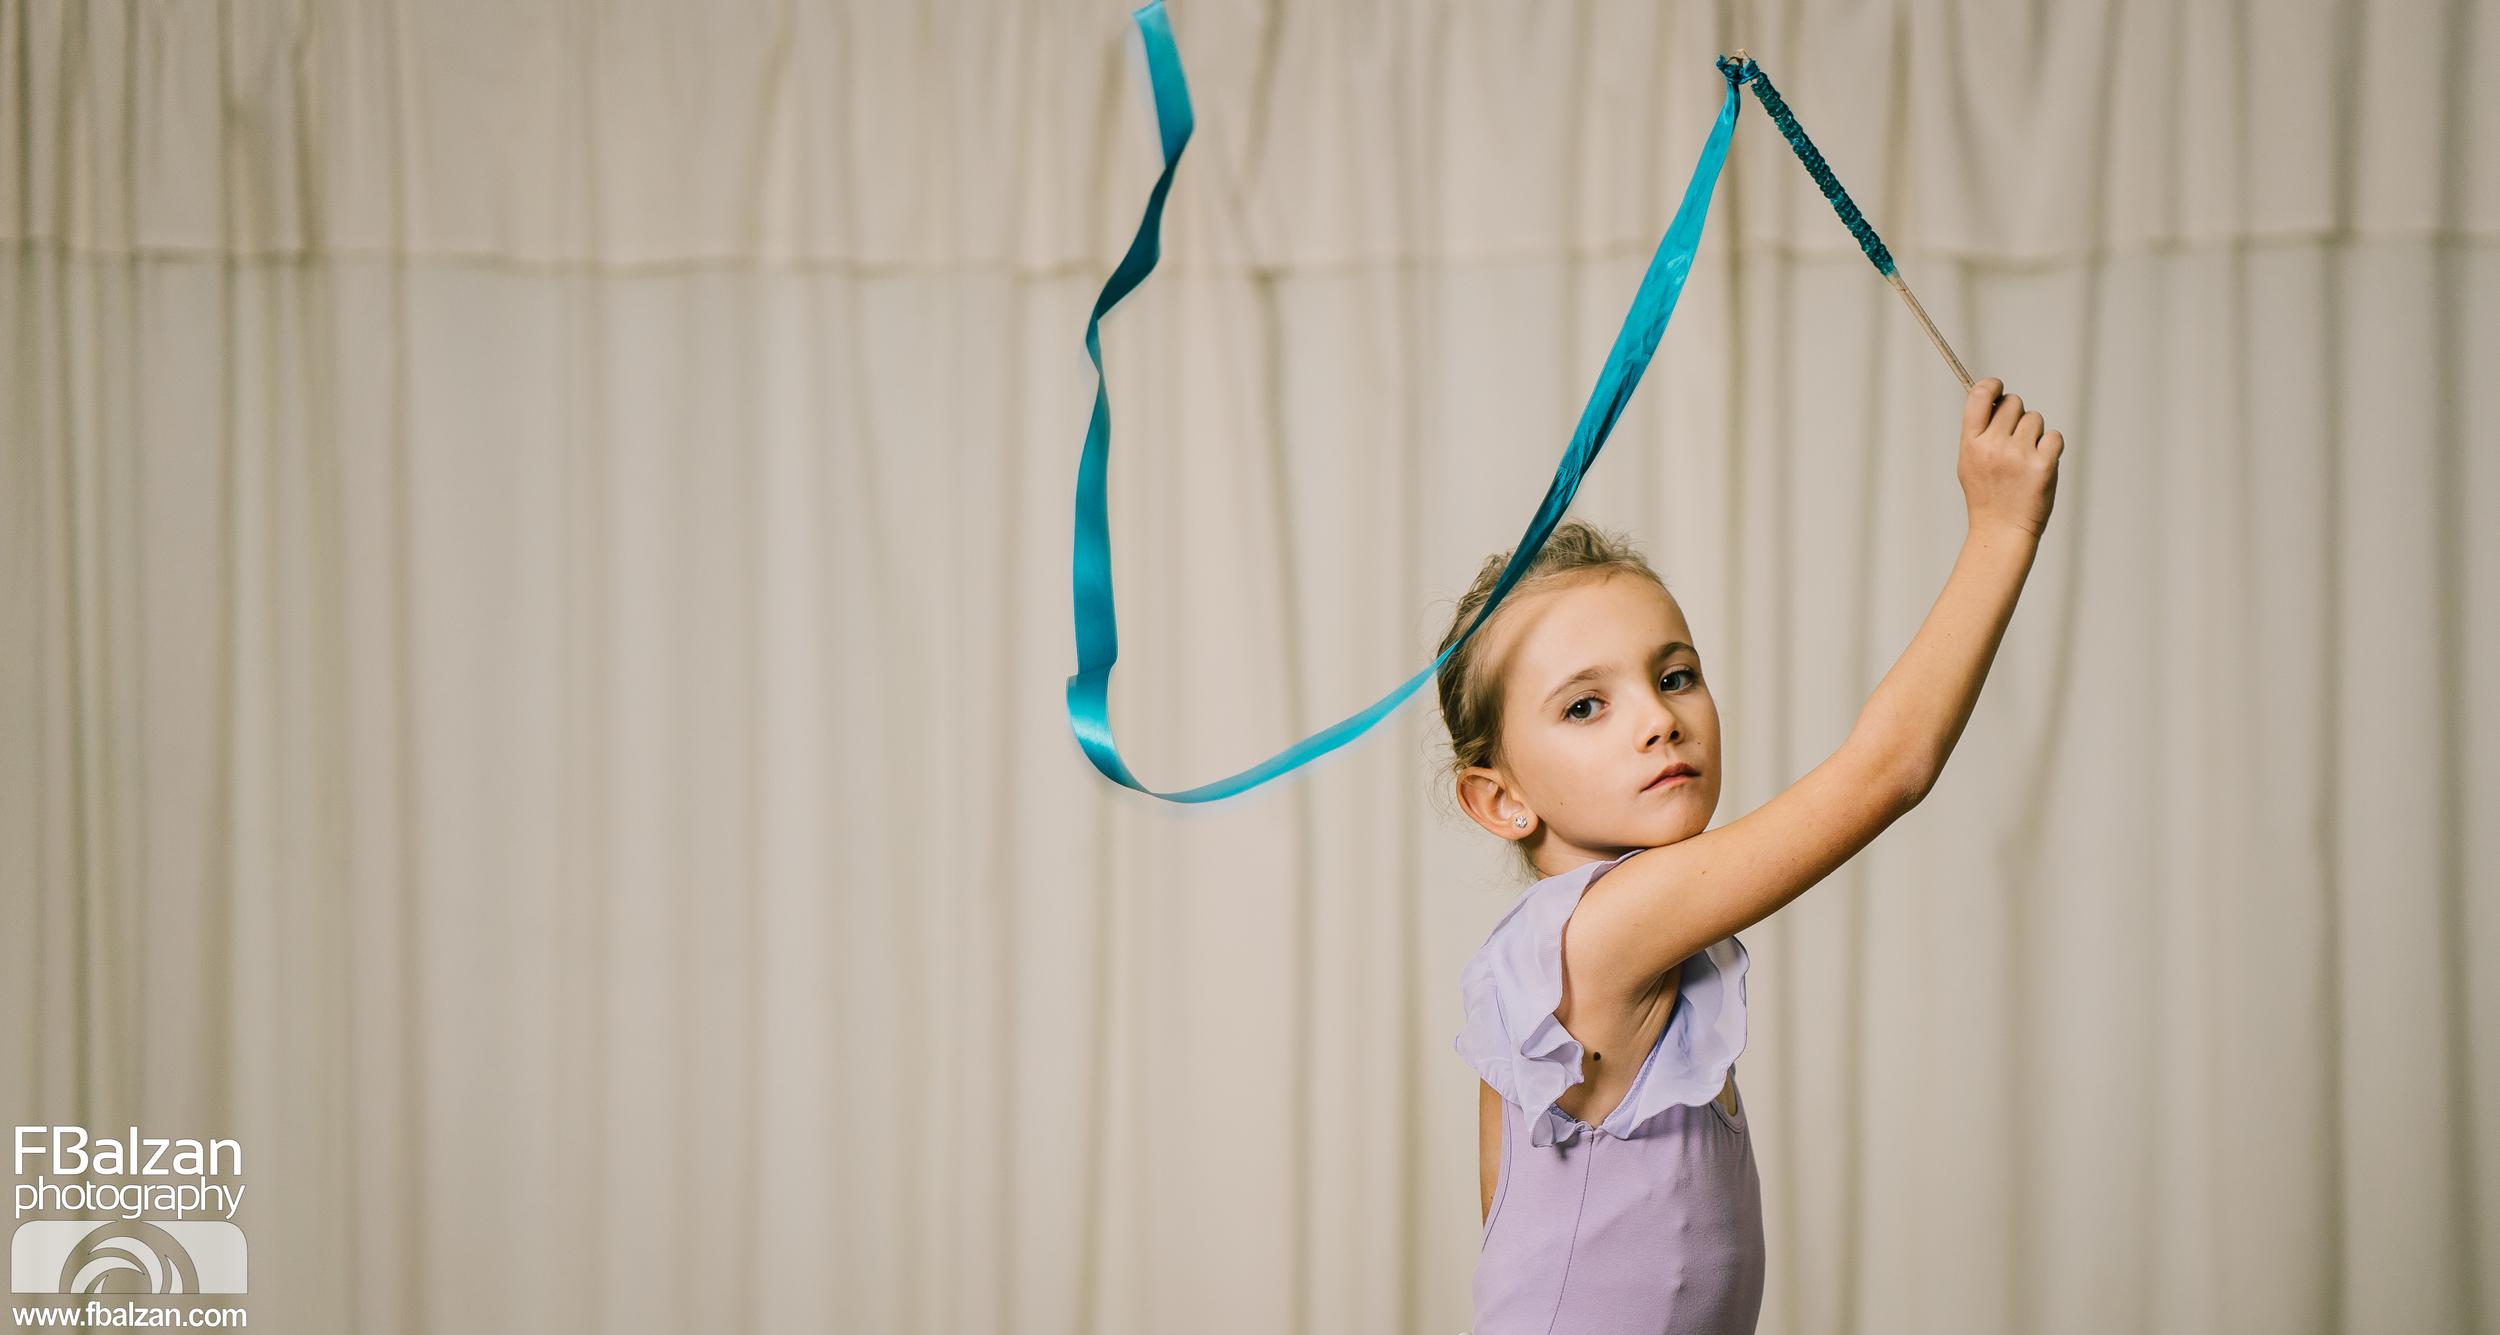 652 -  Ballet school.jpg